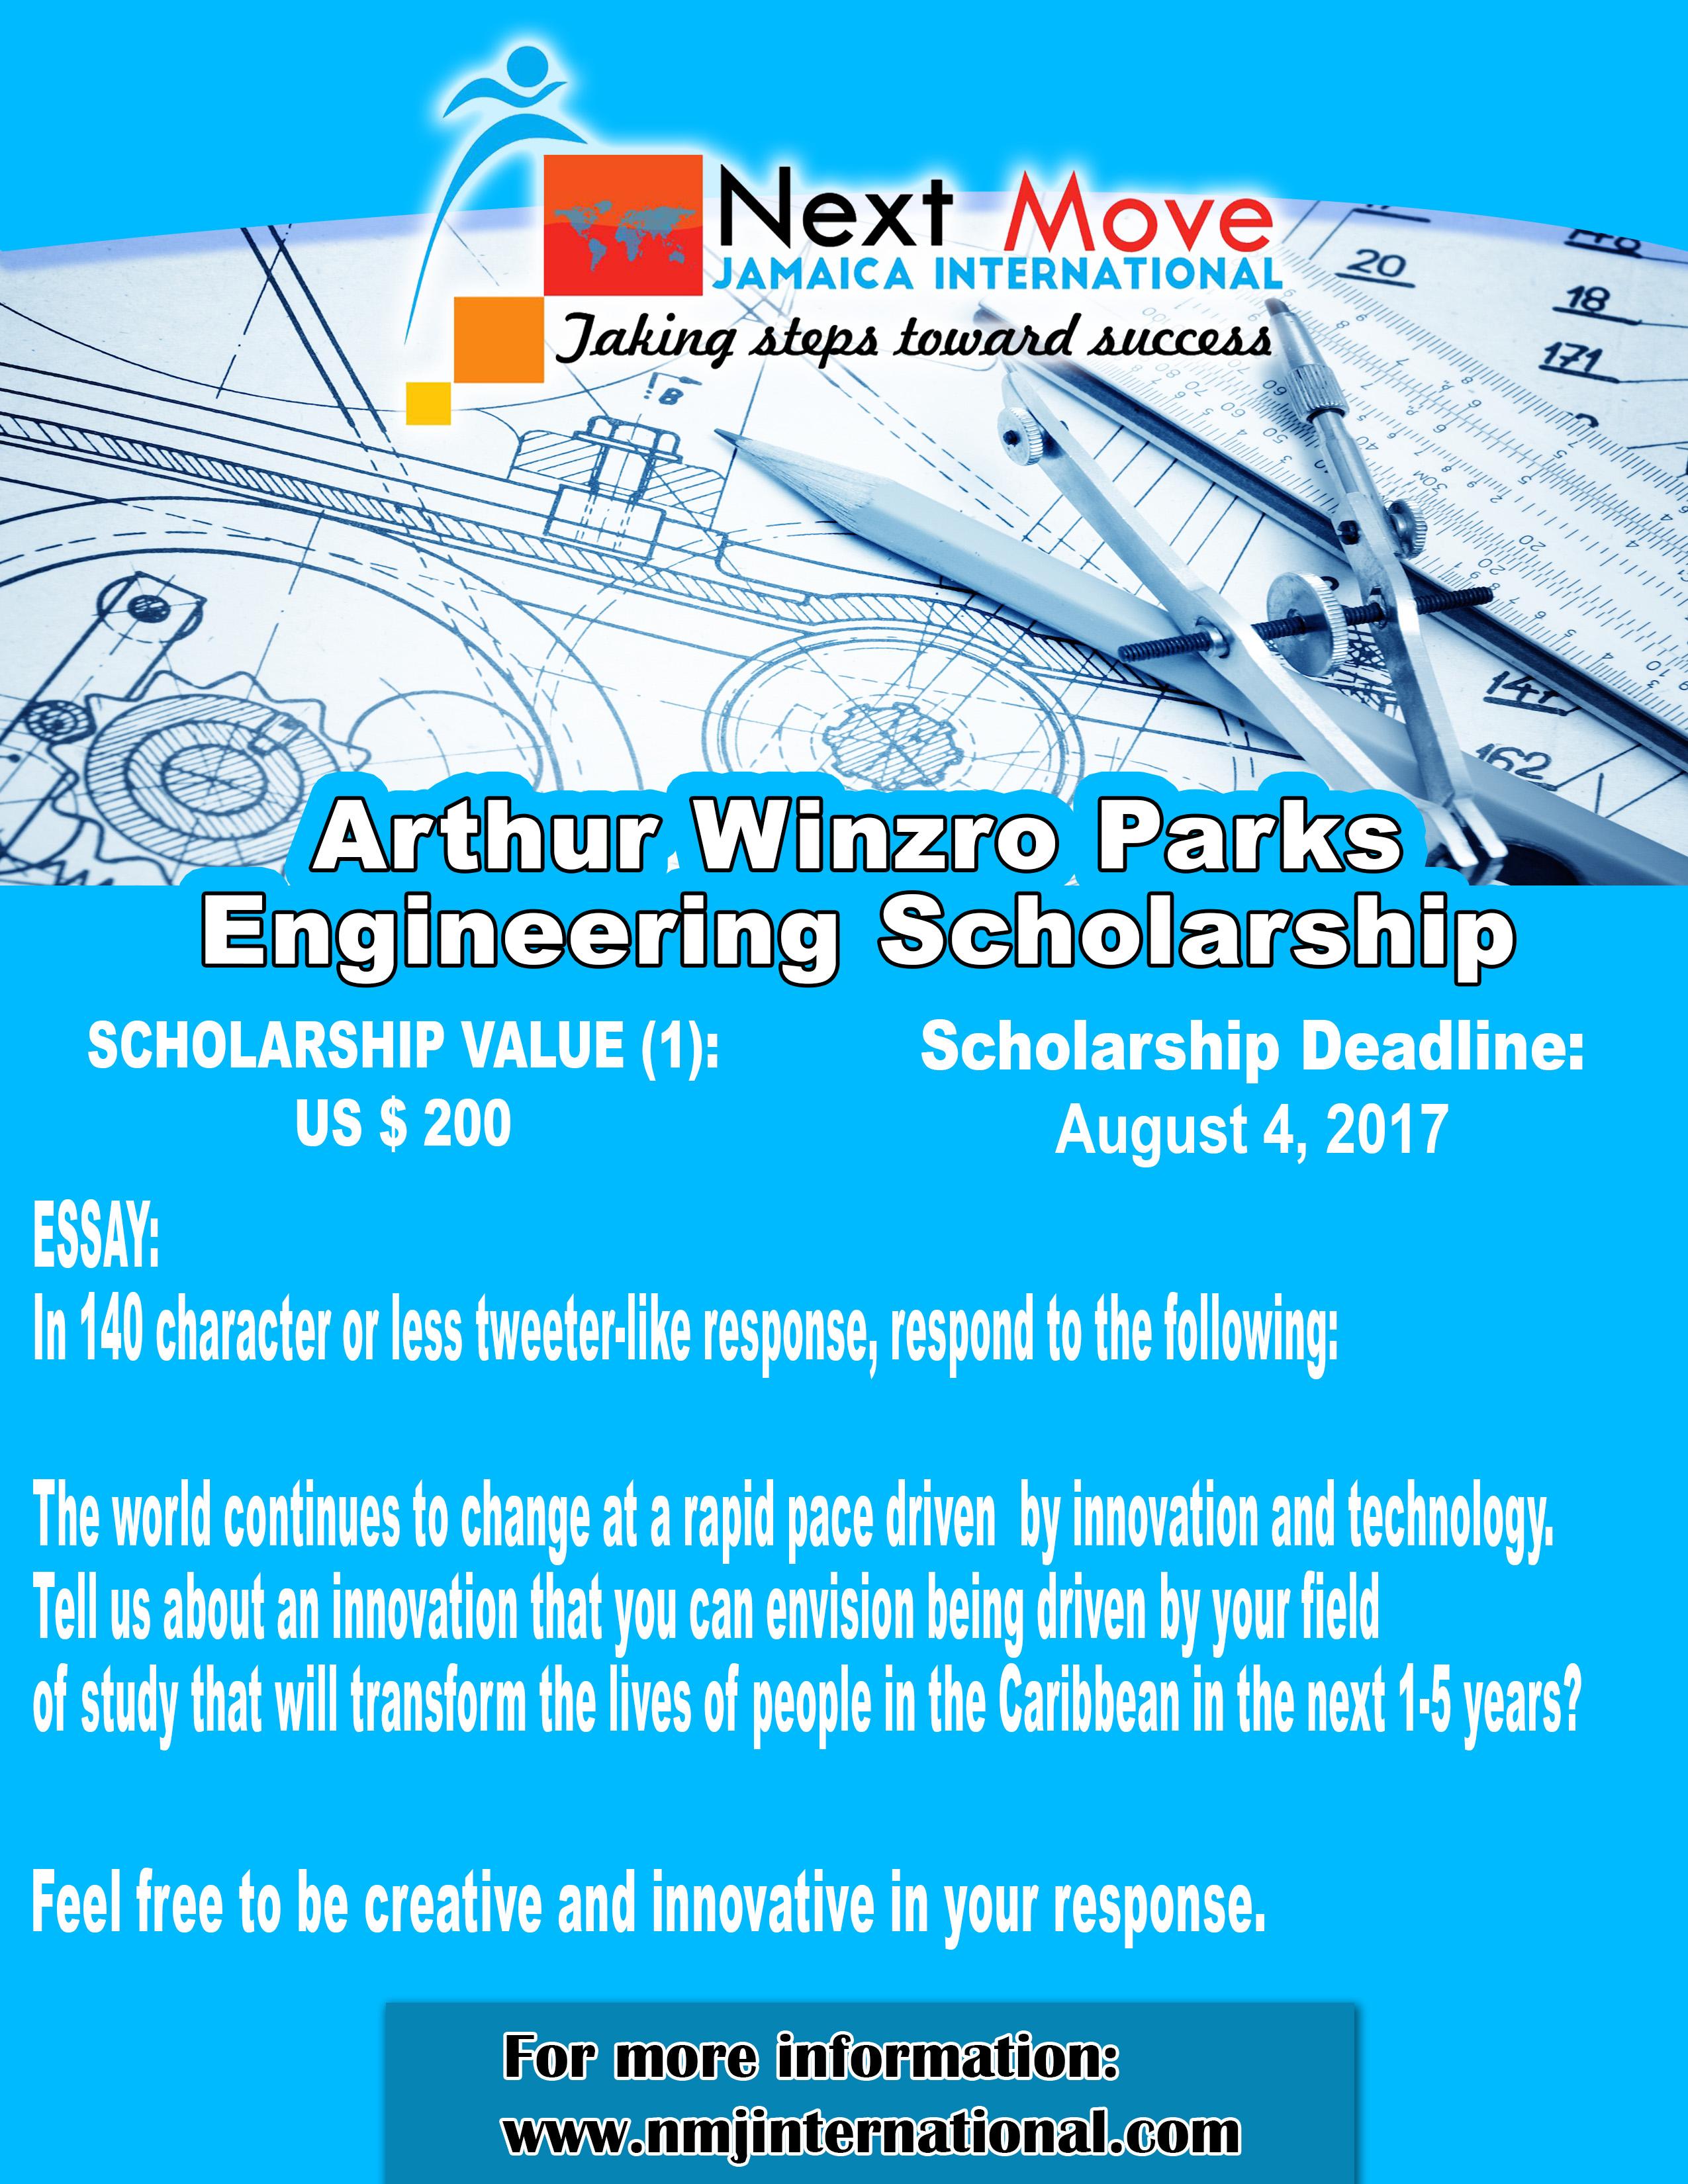 Arthur Winzro Parks Engineering Scholarship